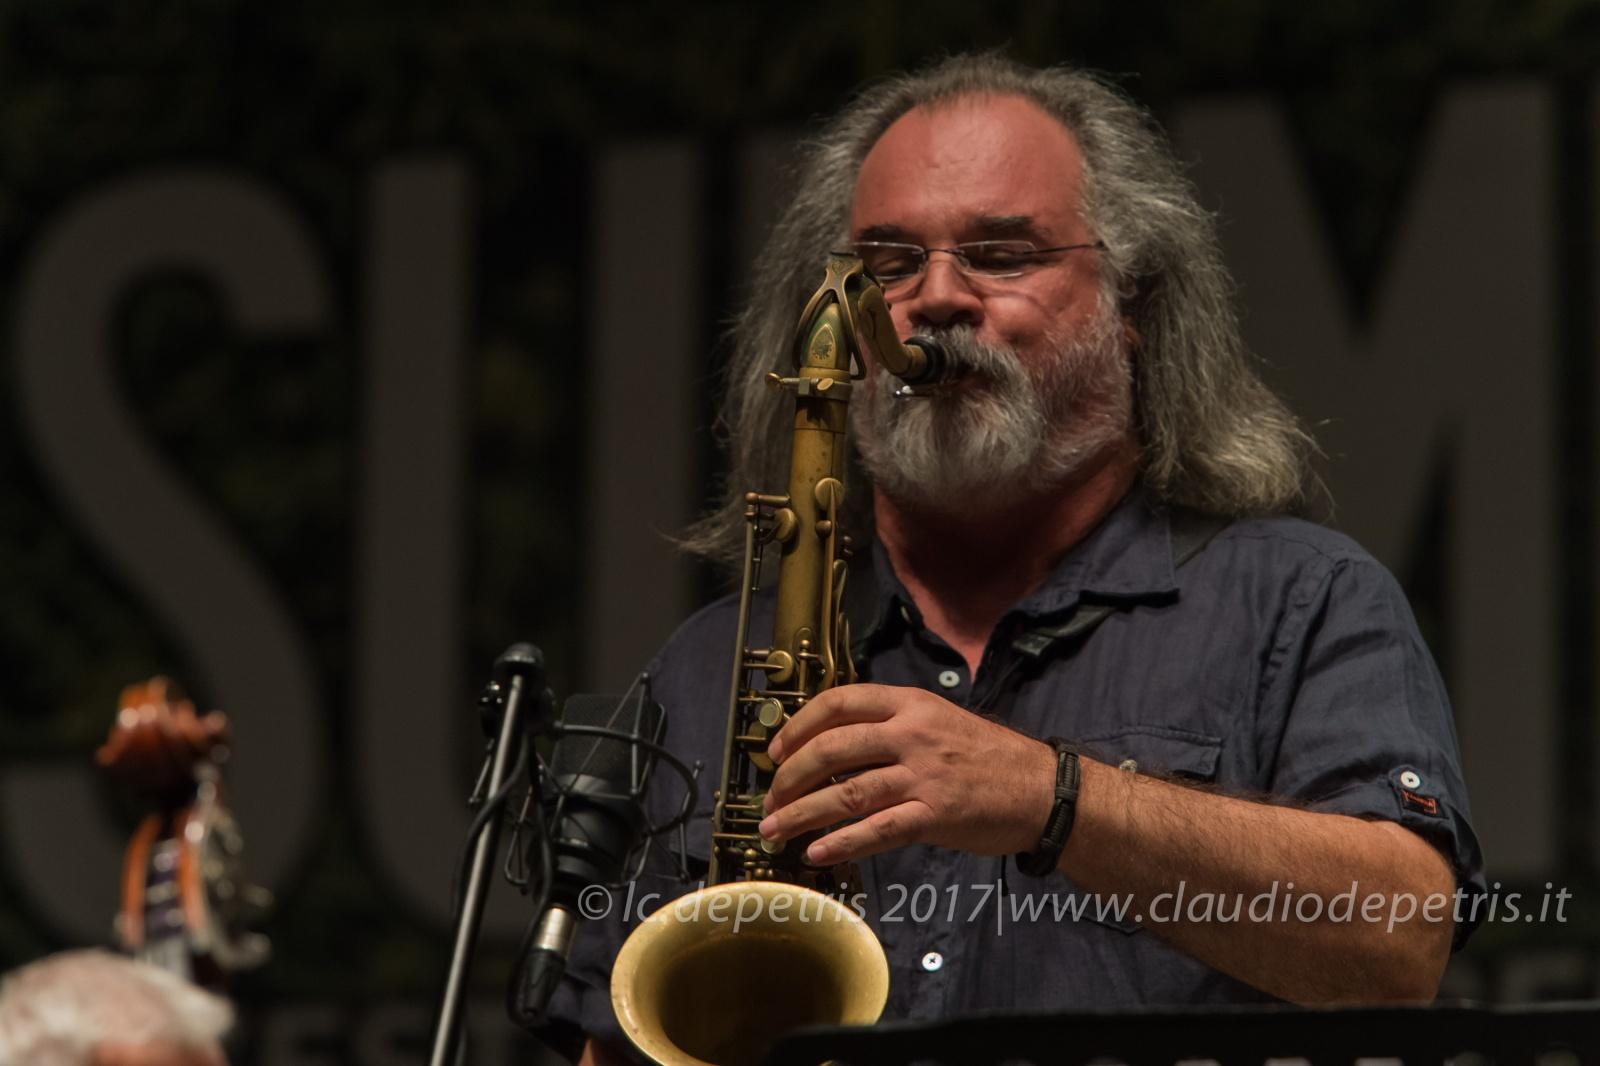 Pasquale Innarella 4tet in concerto alla Casa del Jazz, 26/7/2017